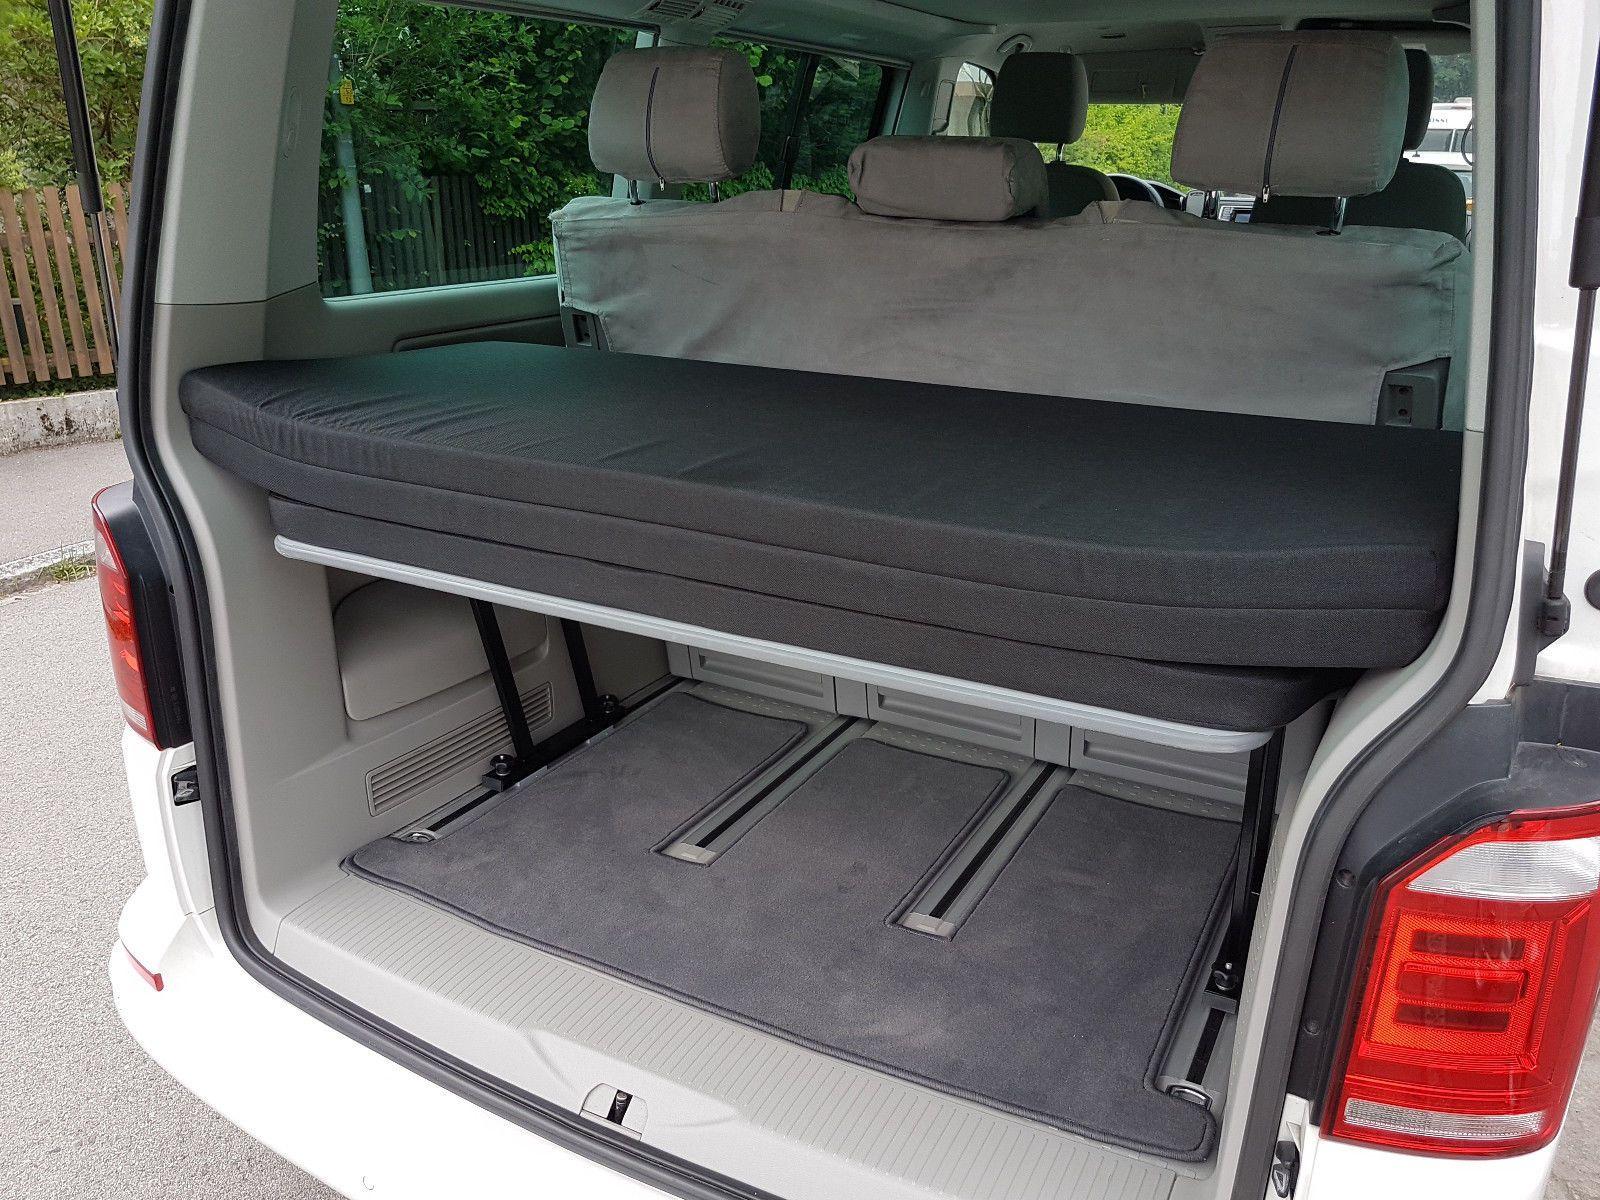 vw t5 t6 multiflexboard l scharnier board matratze schlafpaket rg50 50 ebay camper. Black Bedroom Furniture Sets. Home Design Ideas